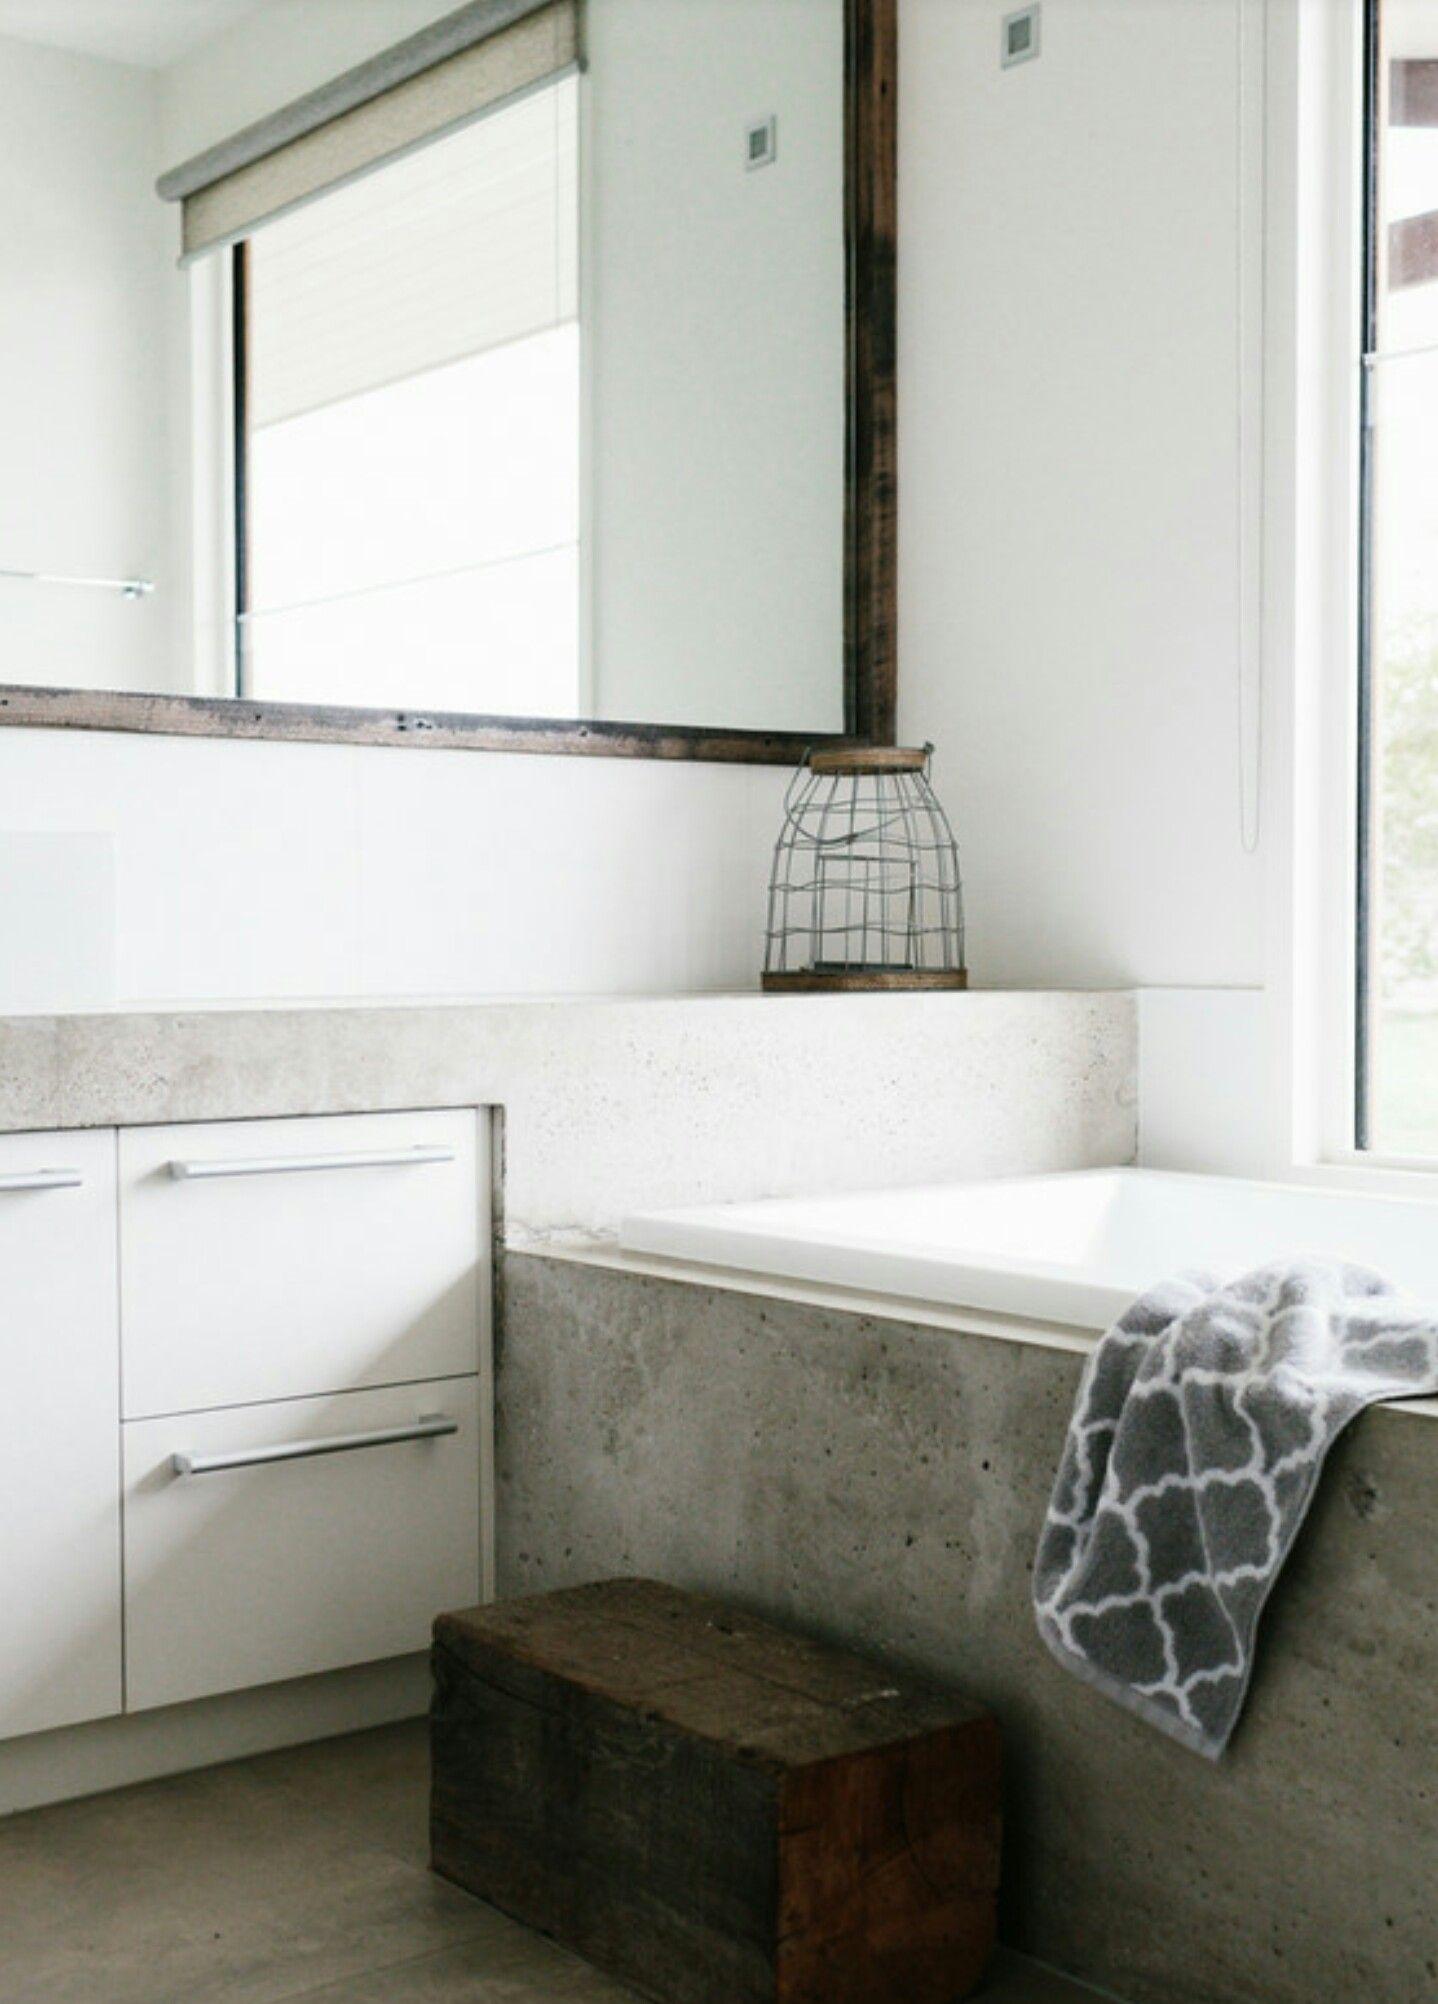 Family bathroom image by Black Salt on Bathroom Concrete